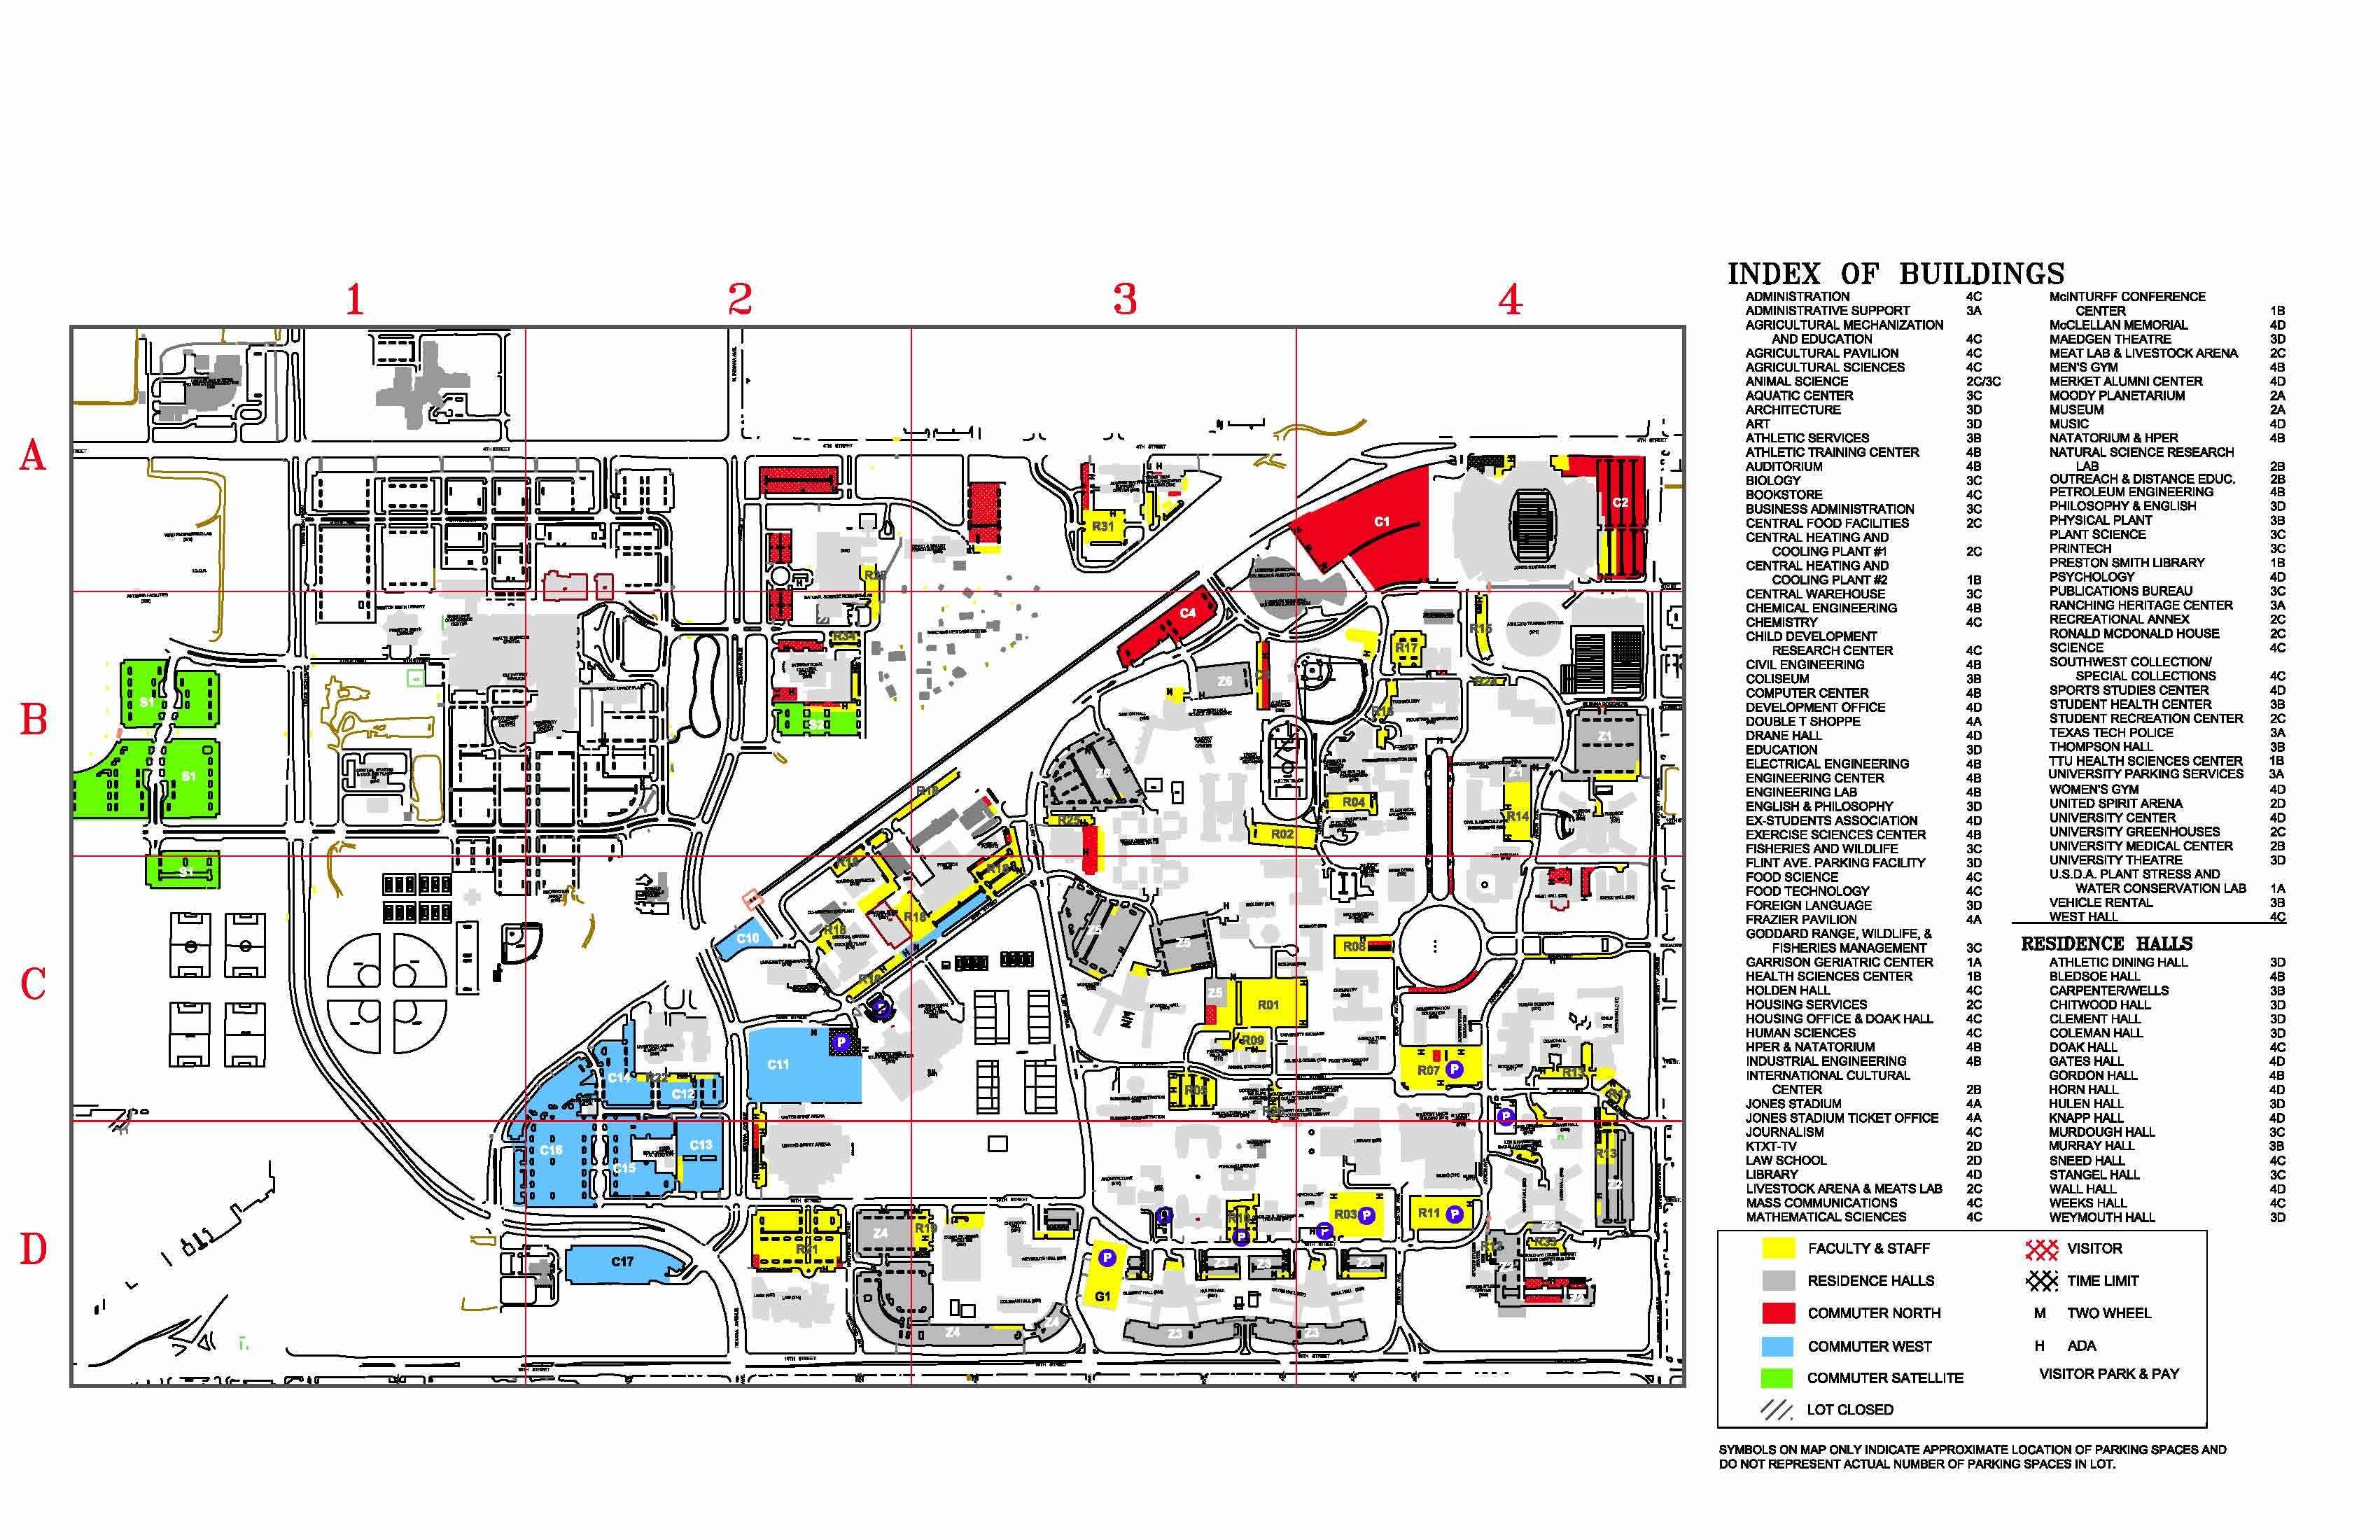 Texas State University Map Mcc Campus Map - Texas Tech Housing Map